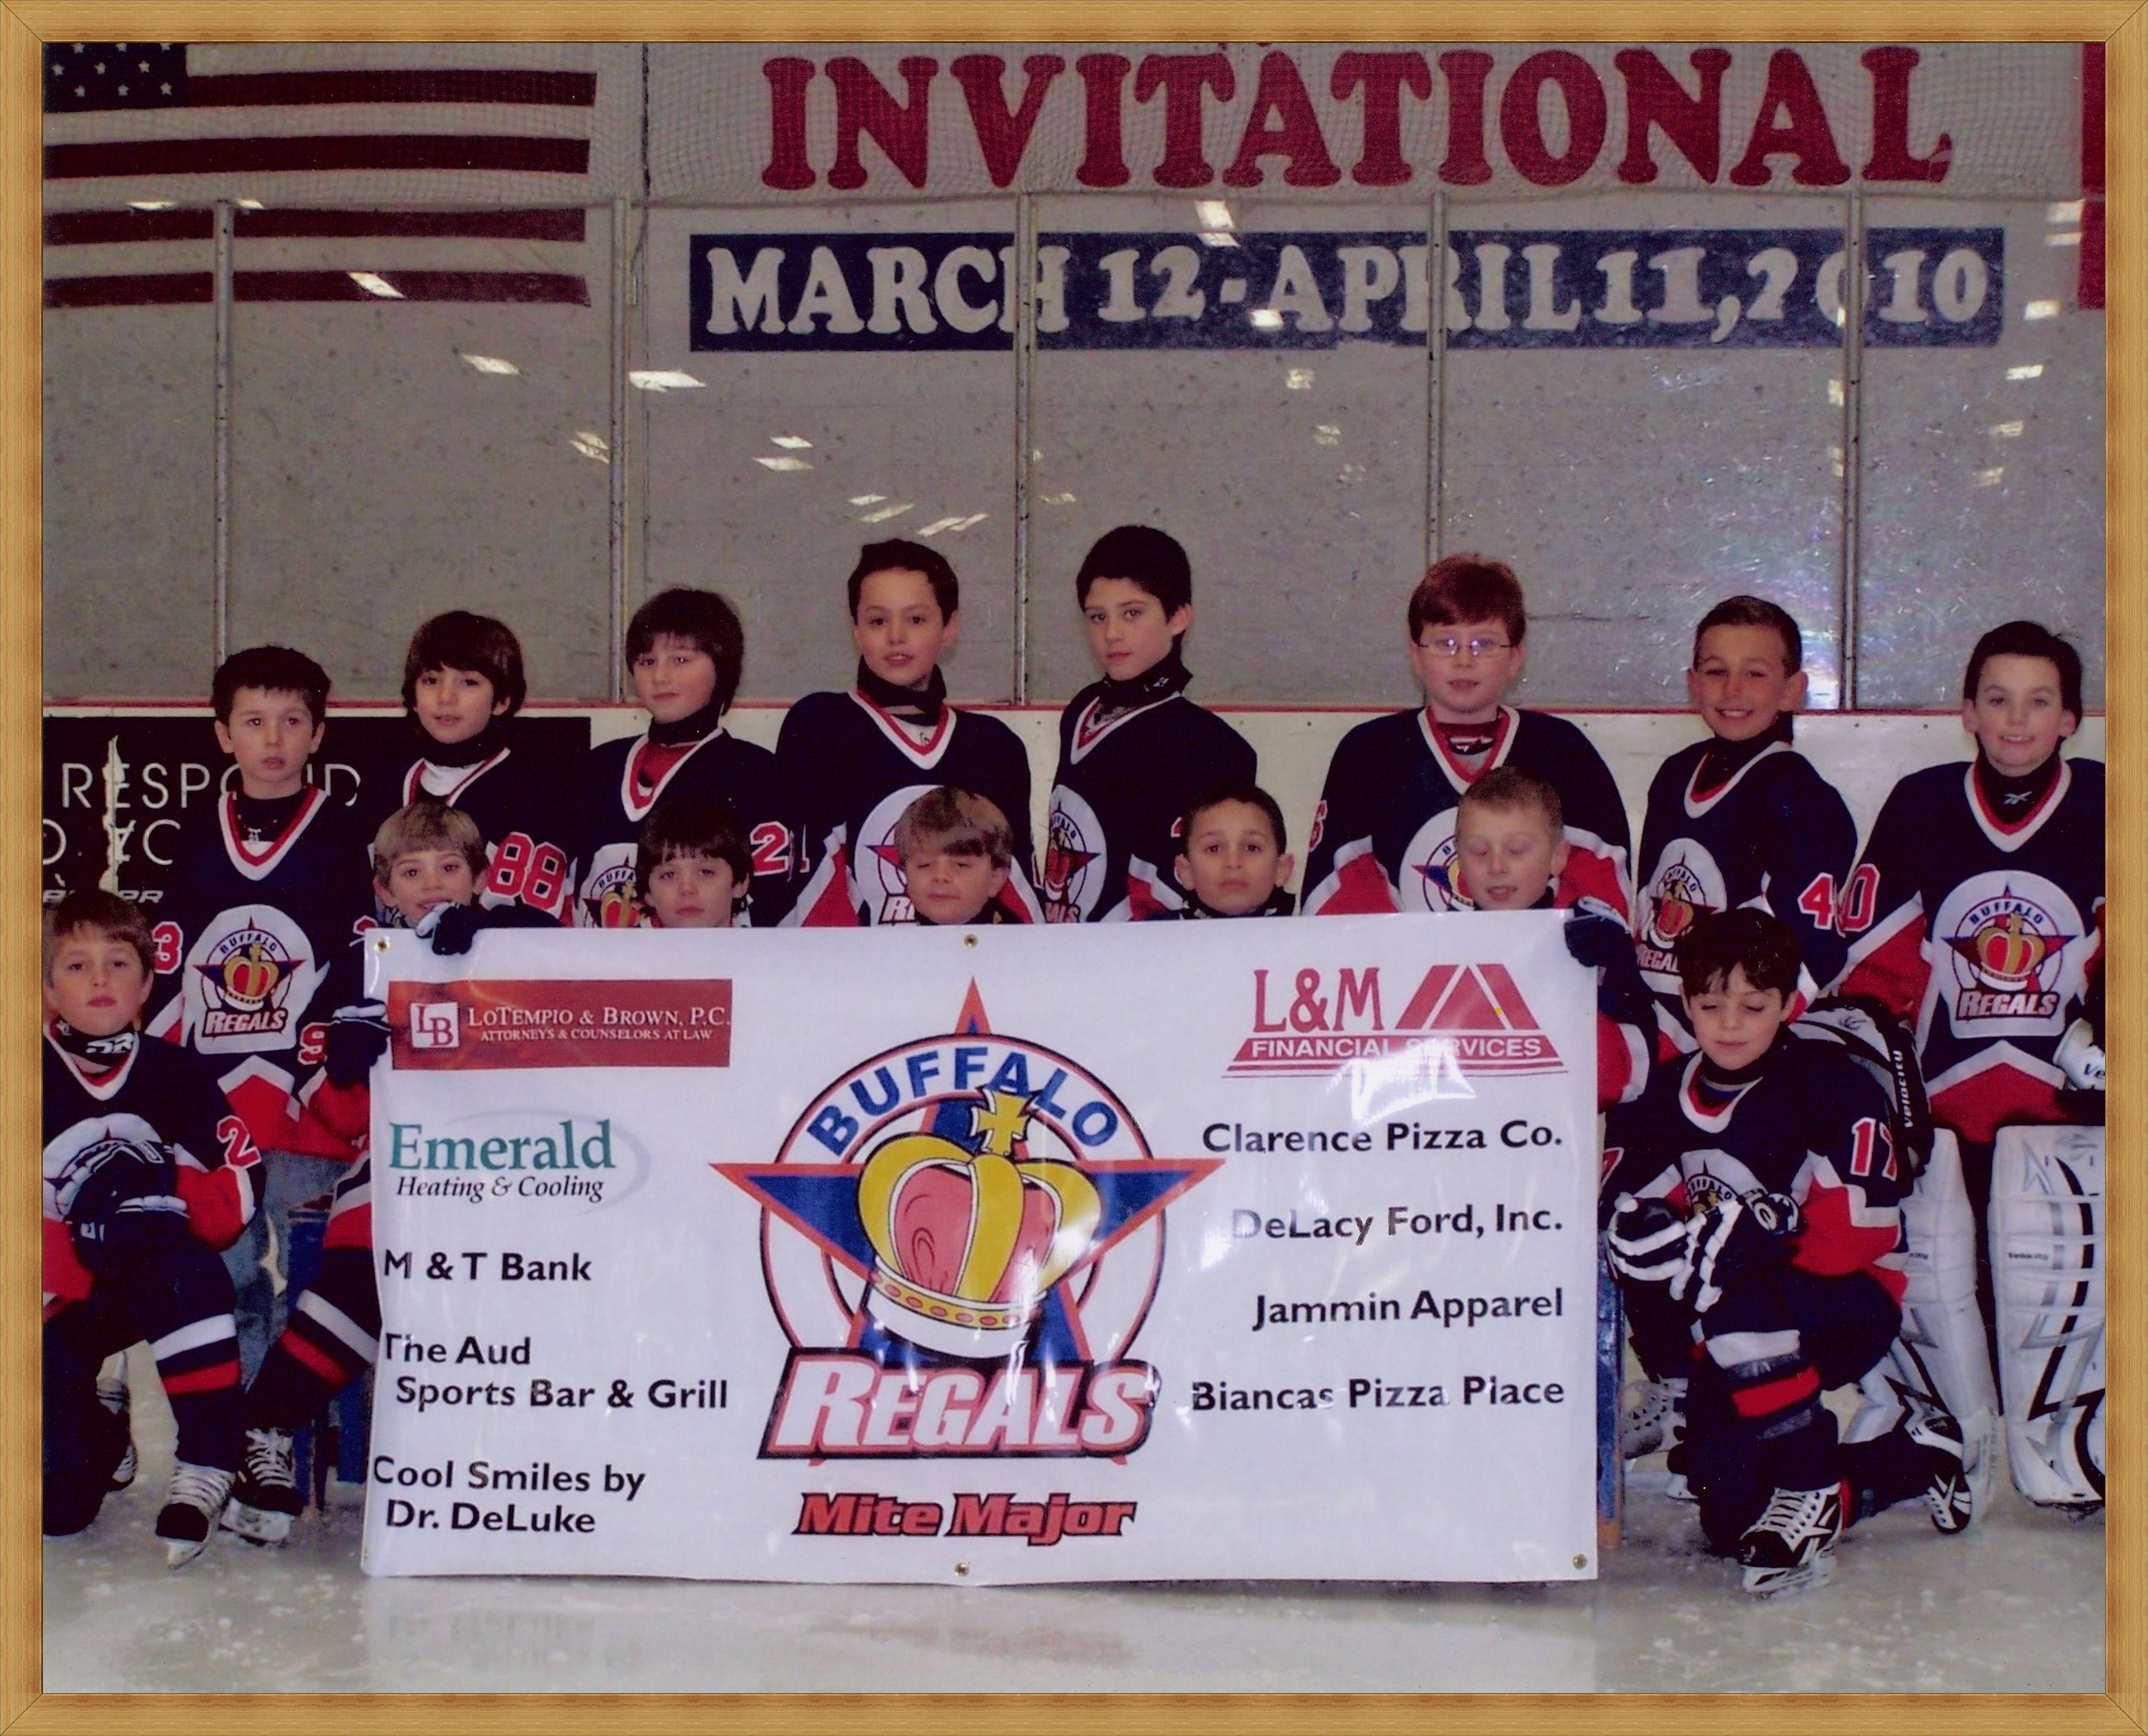 Emerald Heating Cooling Inc Sponsored The Buffalo Regals Hockey